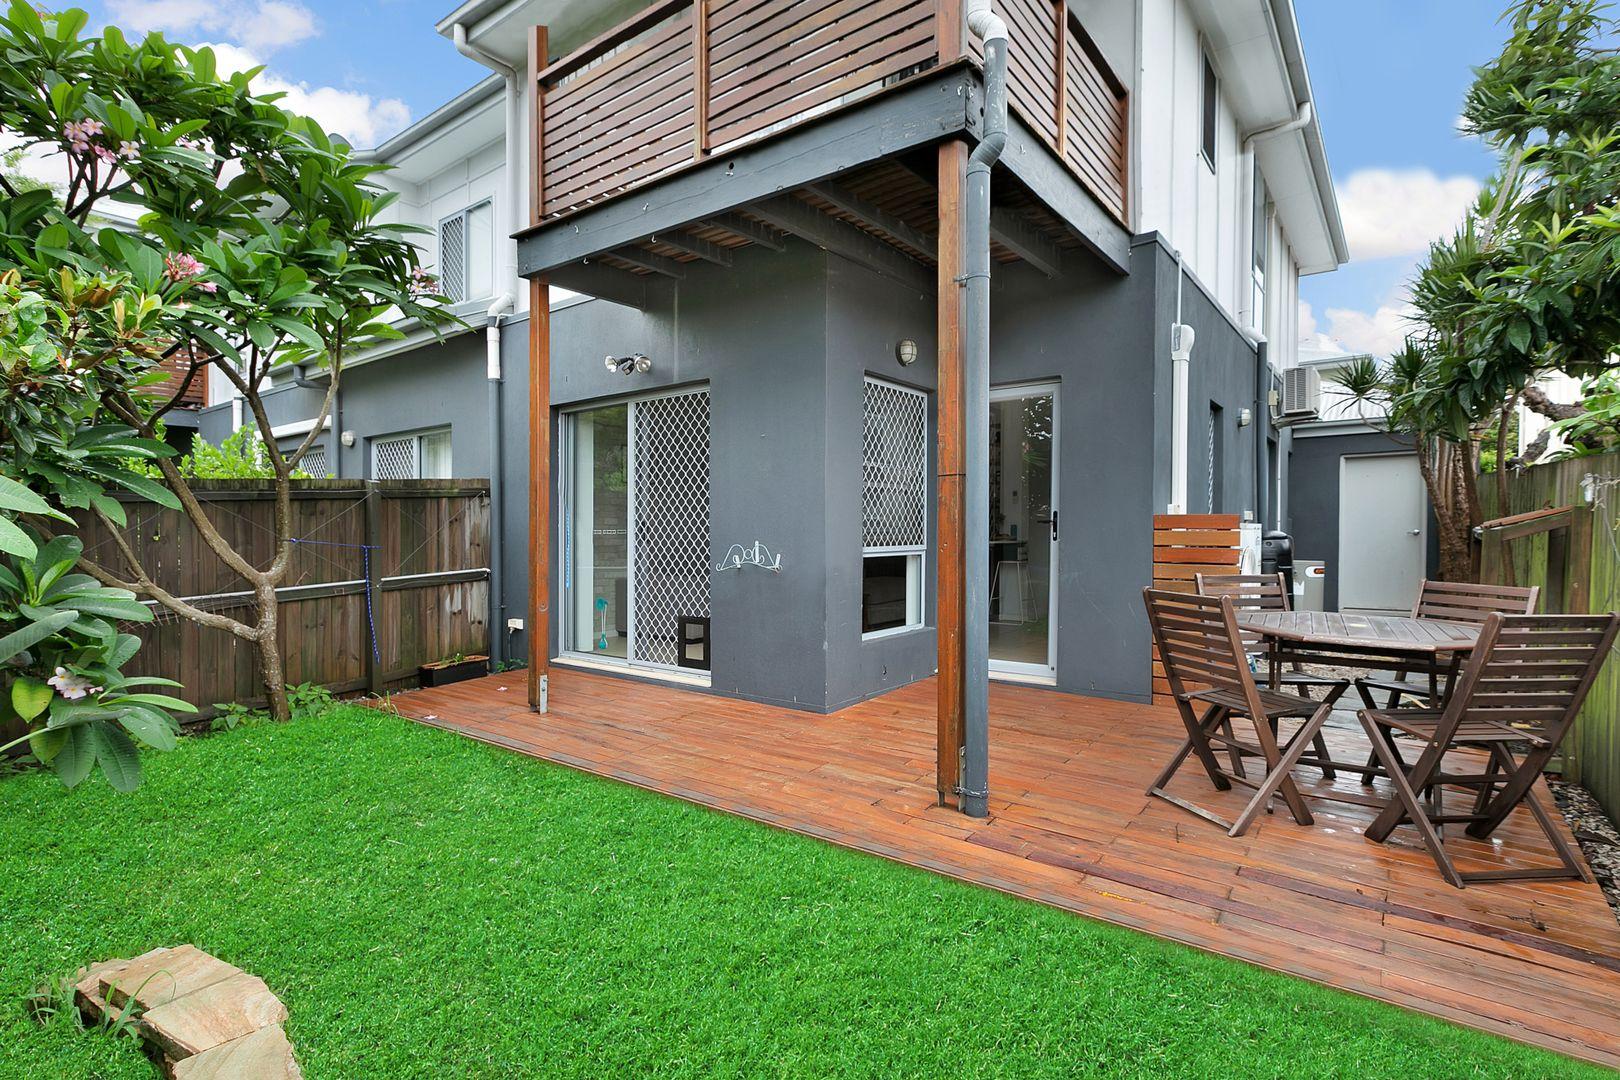 5/12 Dinmore Street, Moorooka QLD 4105, Image 0